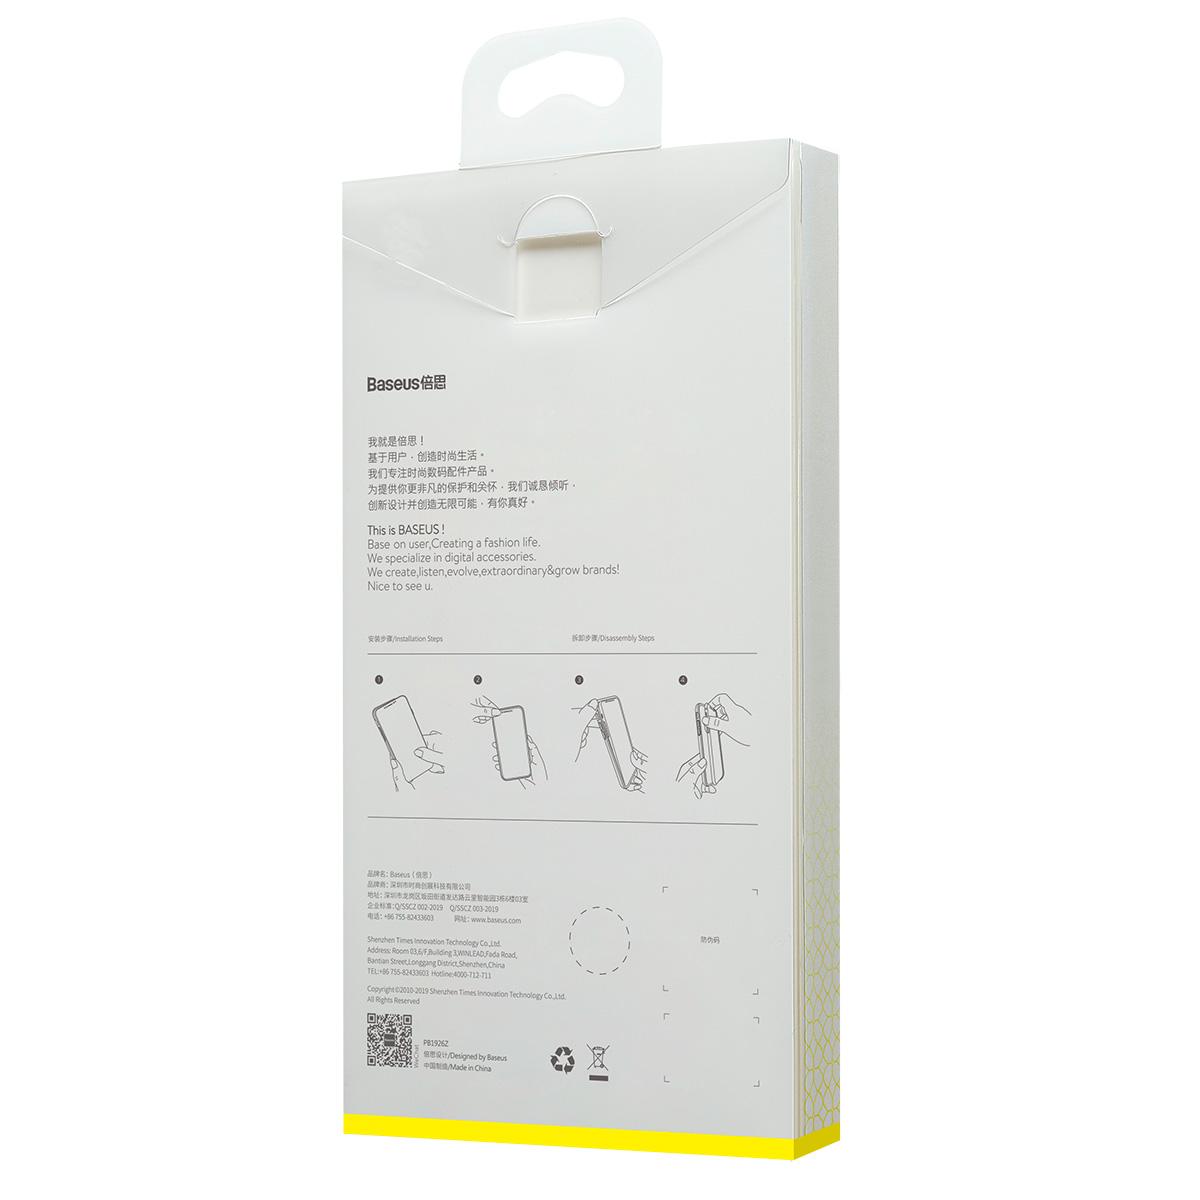 Capa Protetora Baseus Safety Airbags para iPhone 11 Pro Max